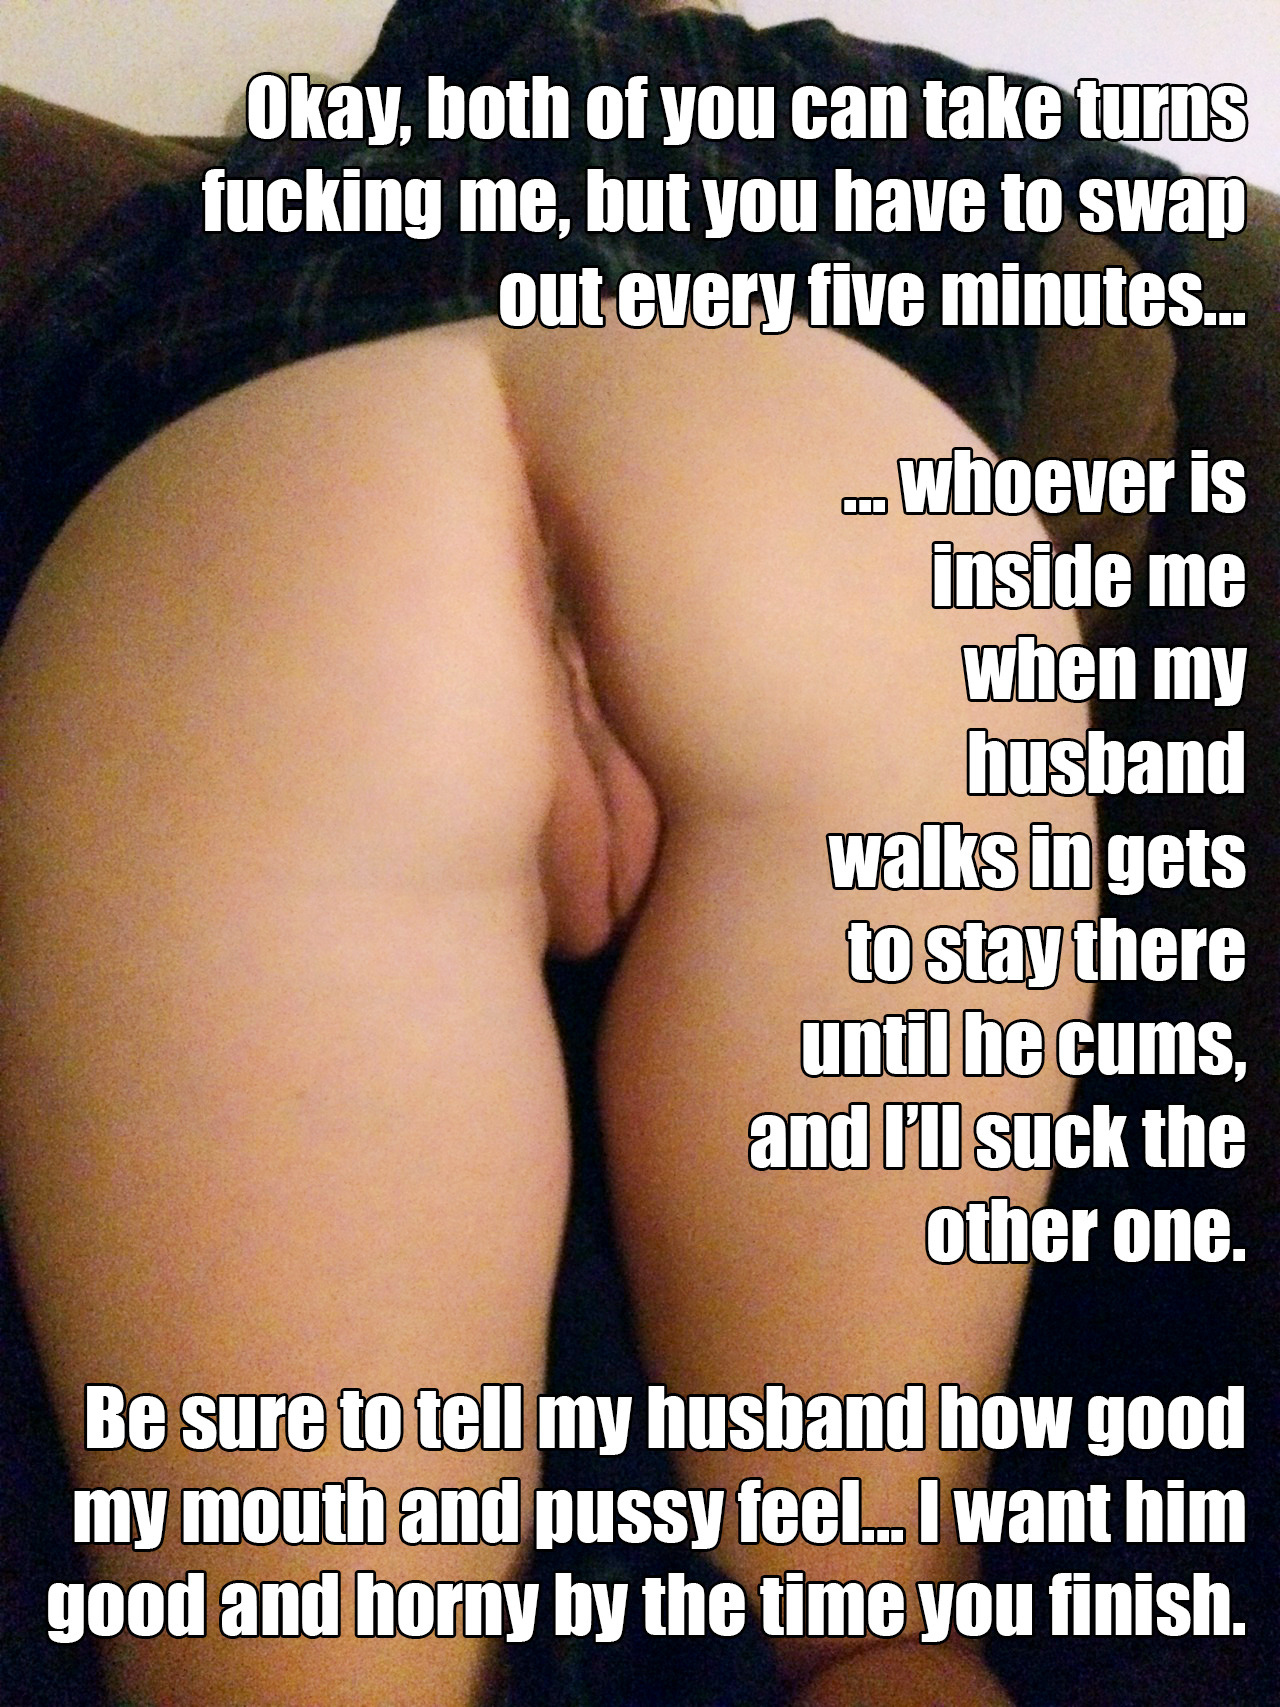 unfaithful wife captions tumblr